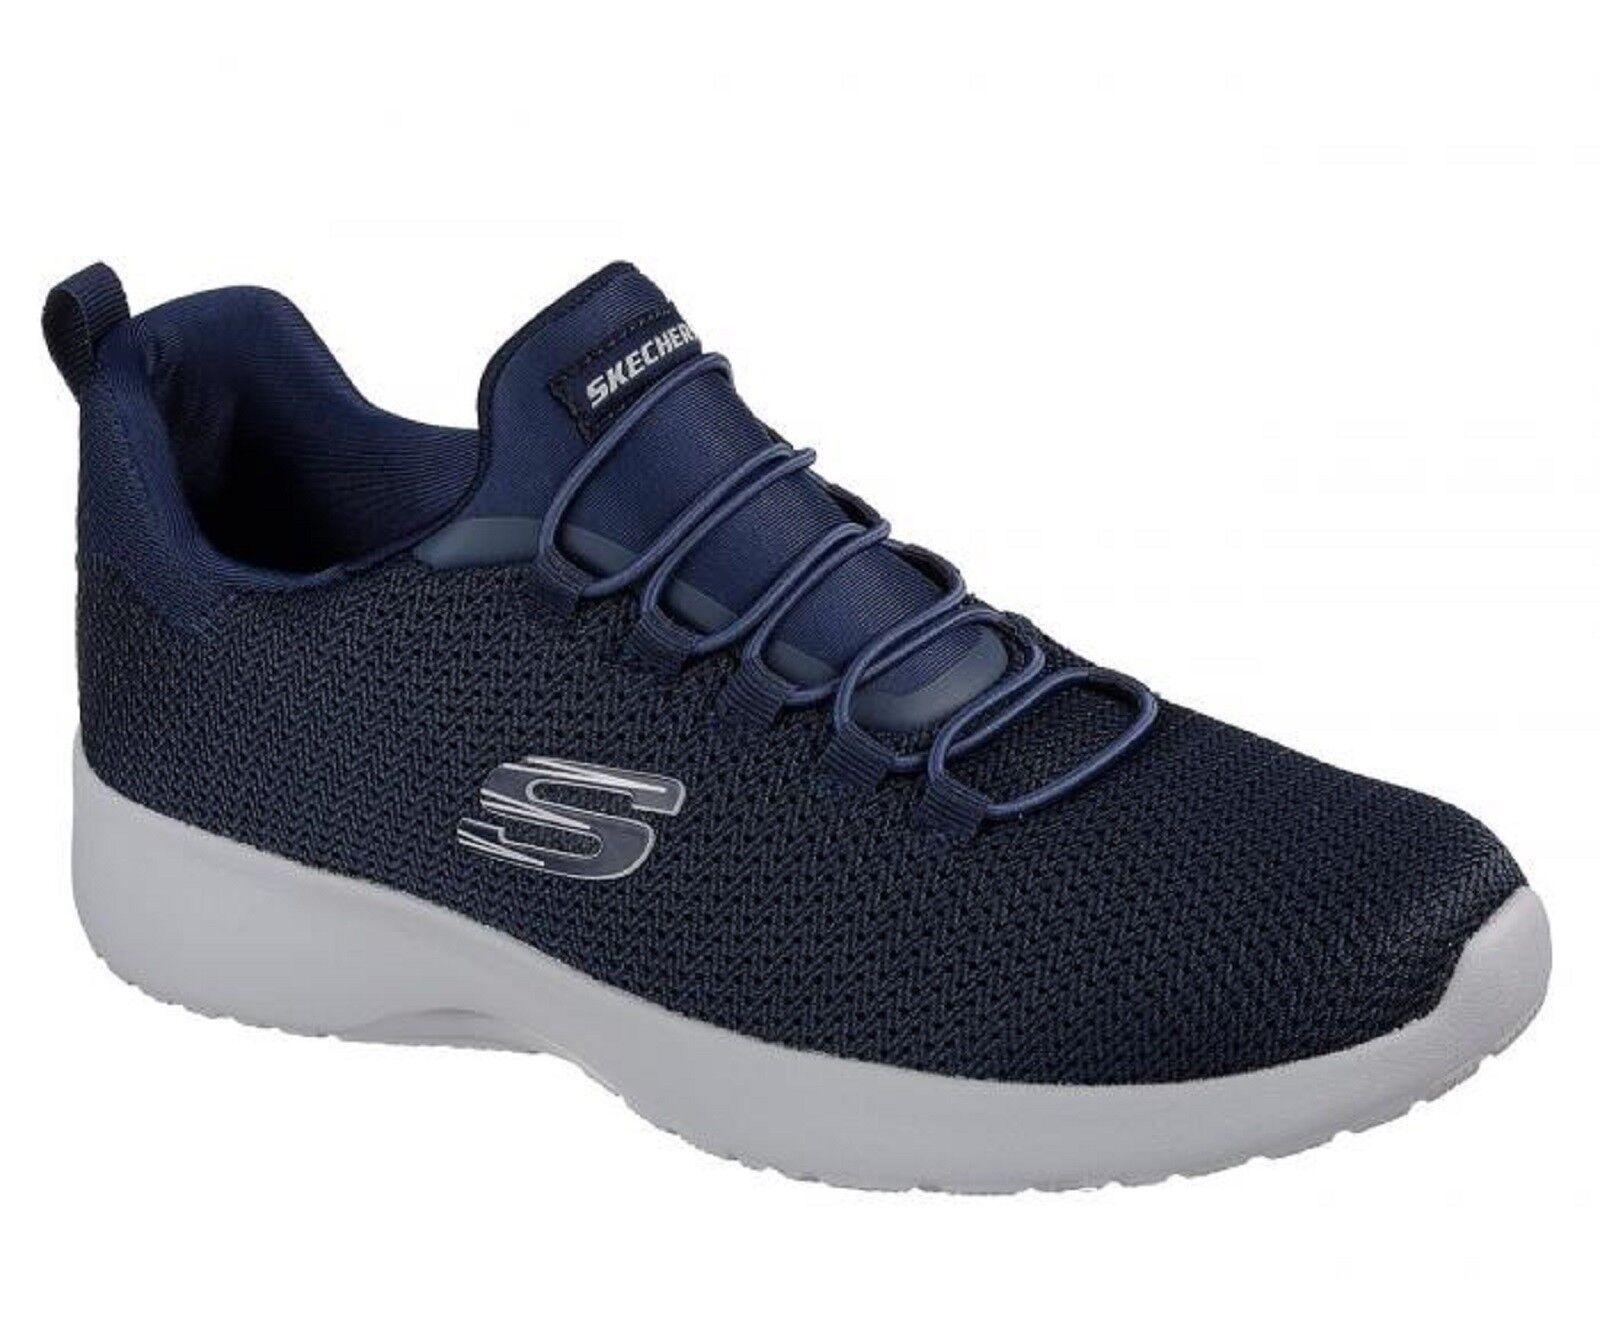 Skechers Womens Dynamite 12119 NVY Memory Foam Slip On Casual Shoes